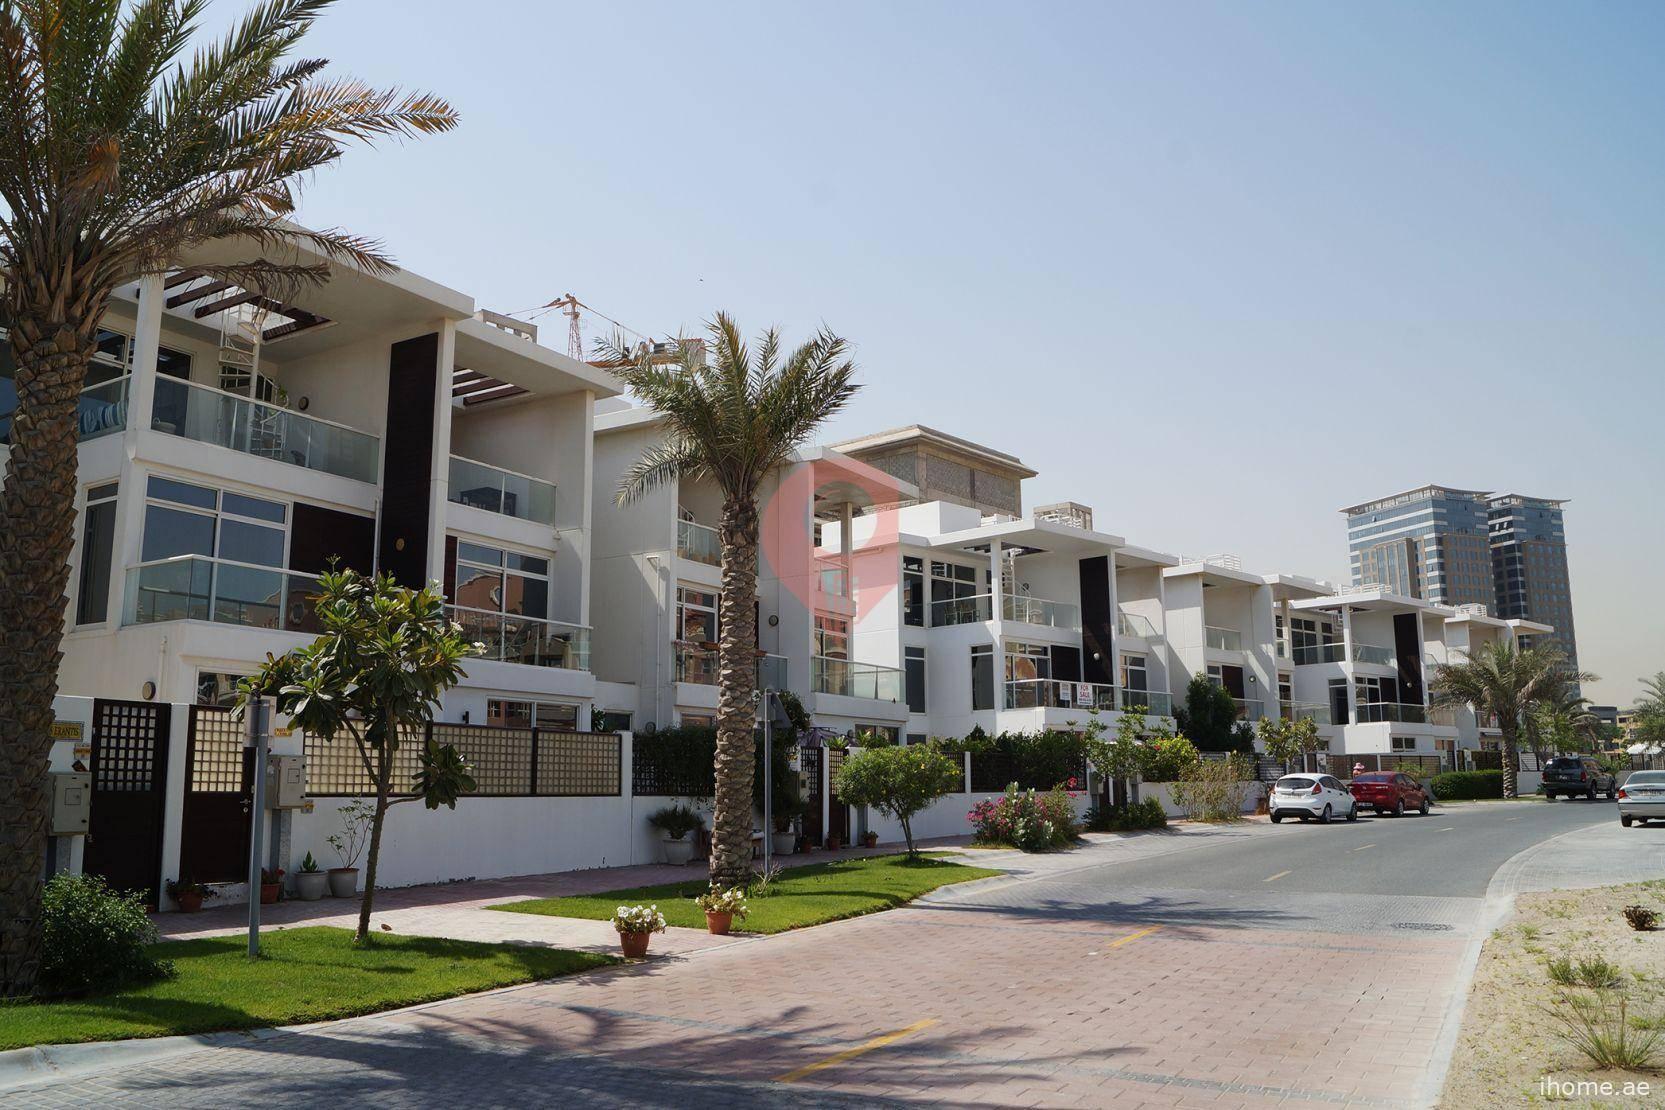 Shamal Waves, Jumeirah Village Circle (JVC)